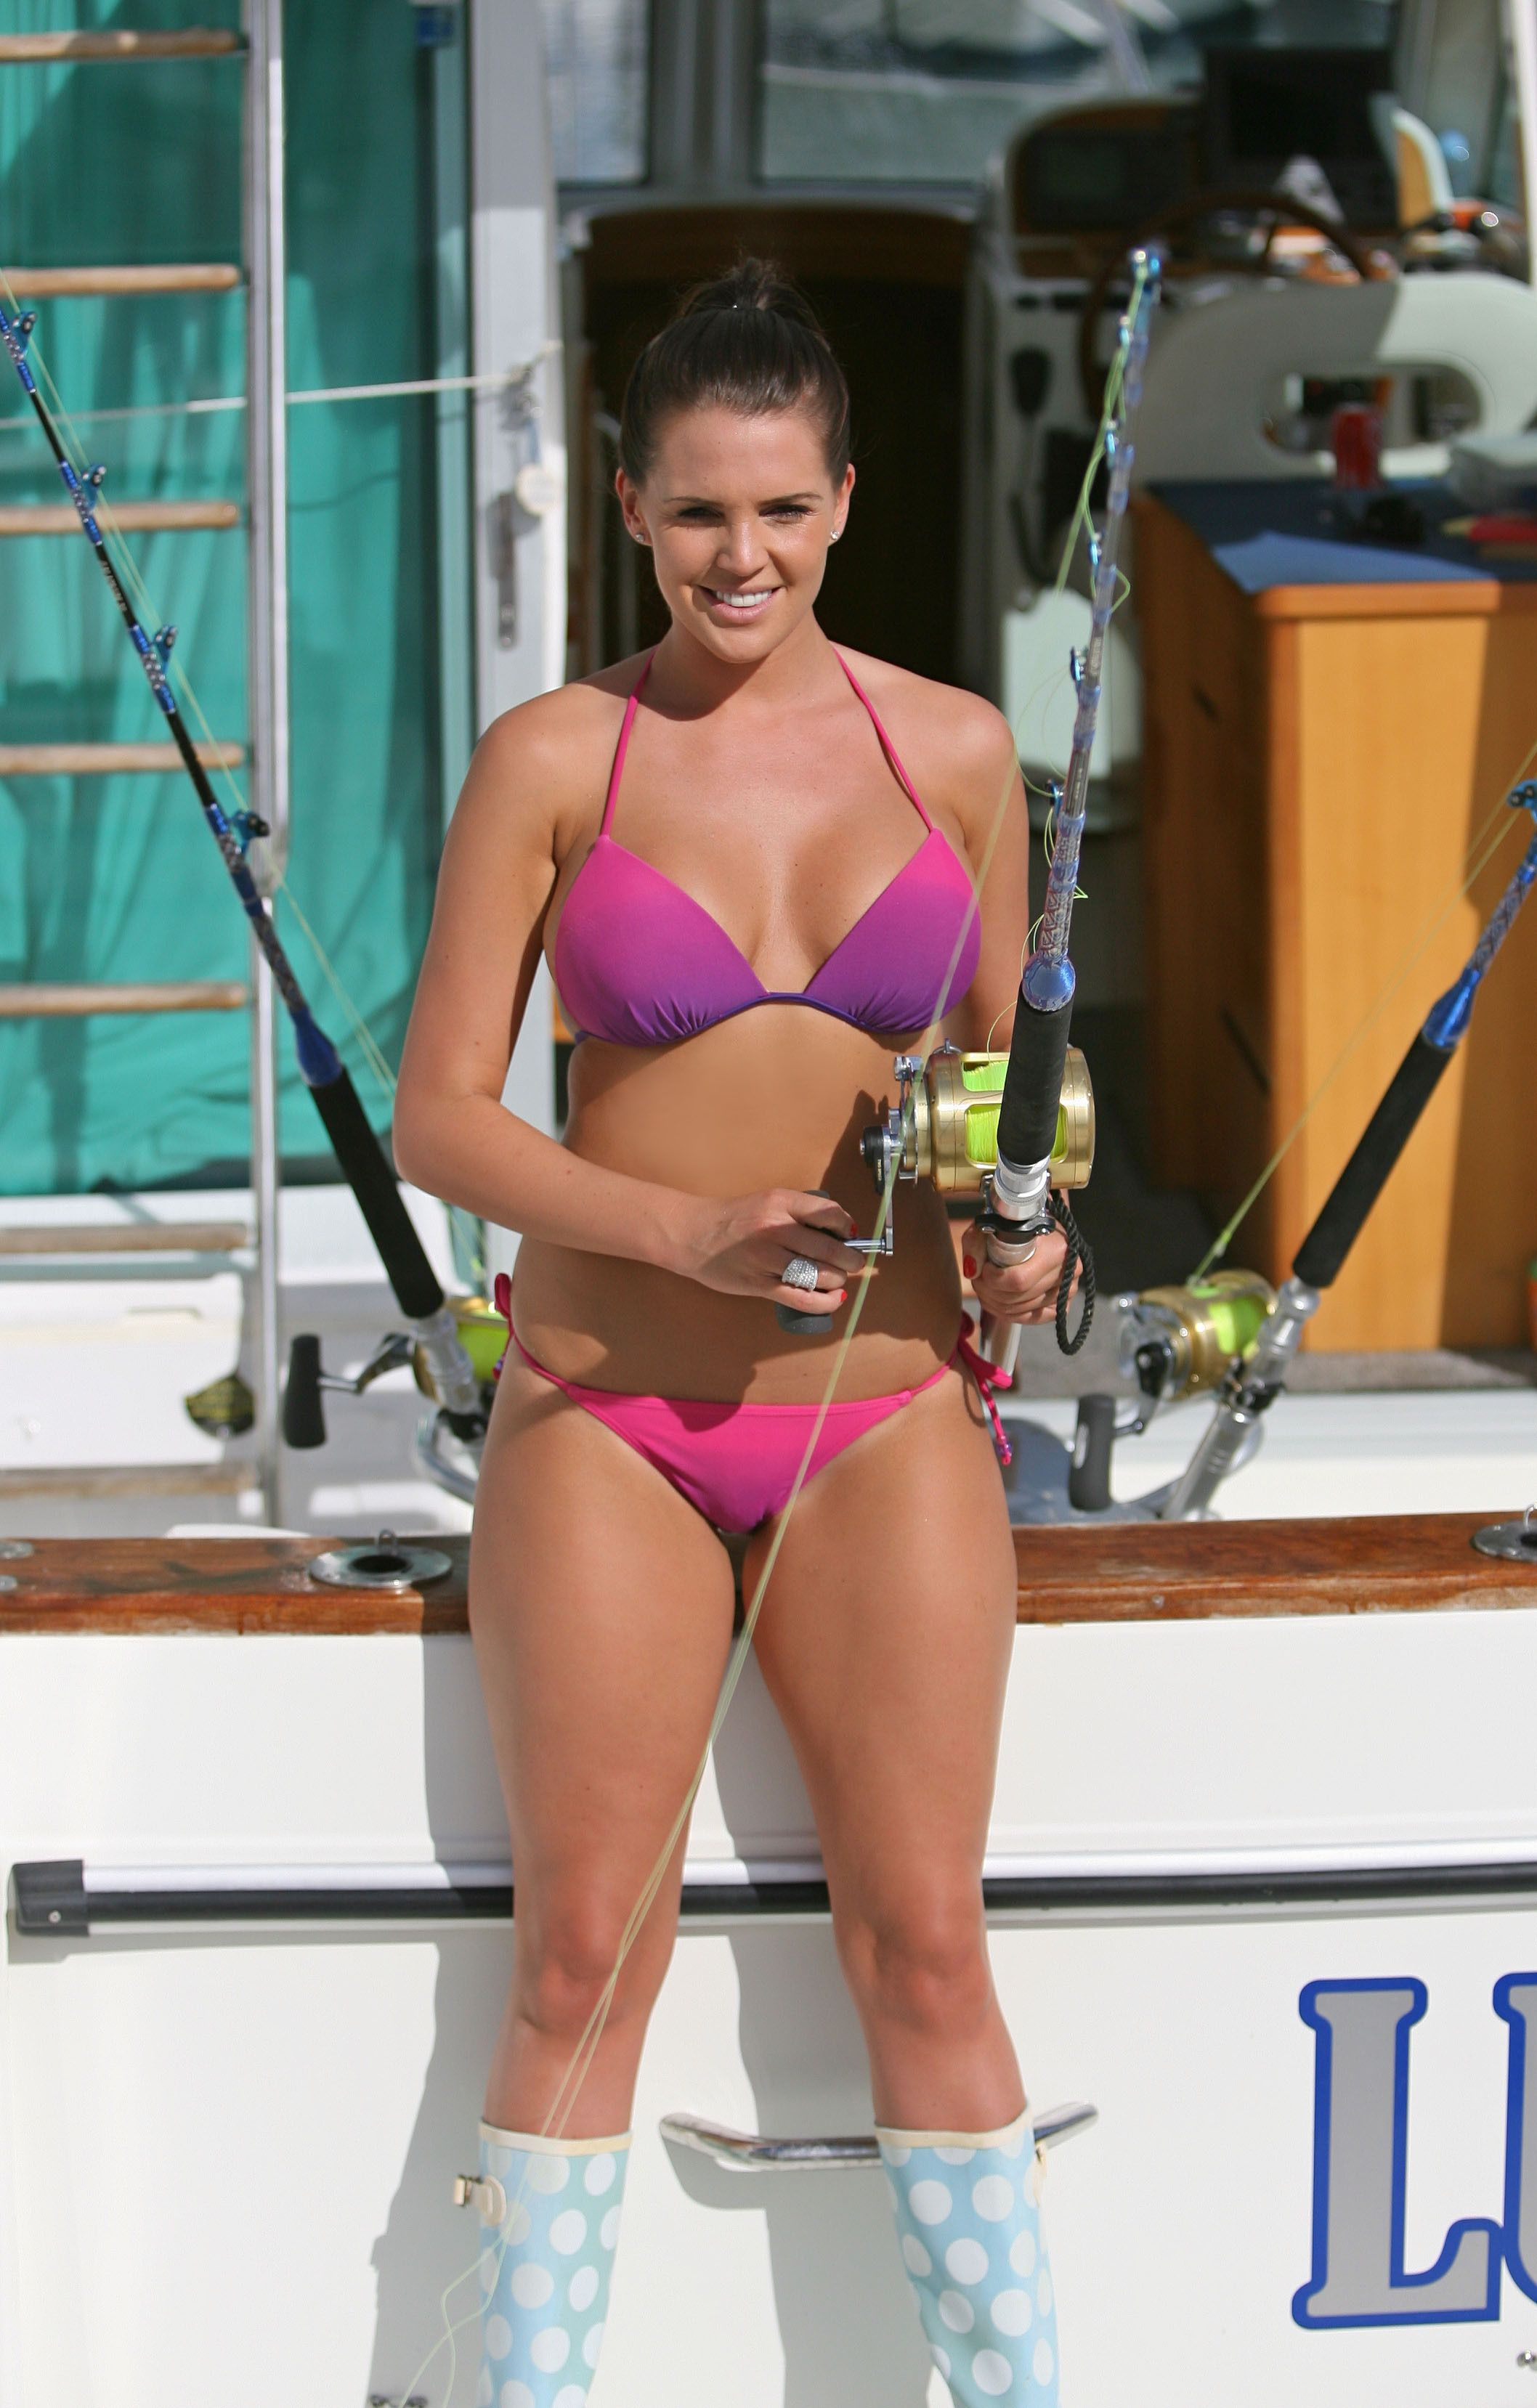 Danielle Lloyd Nude 3 PUBLIC IMAGES